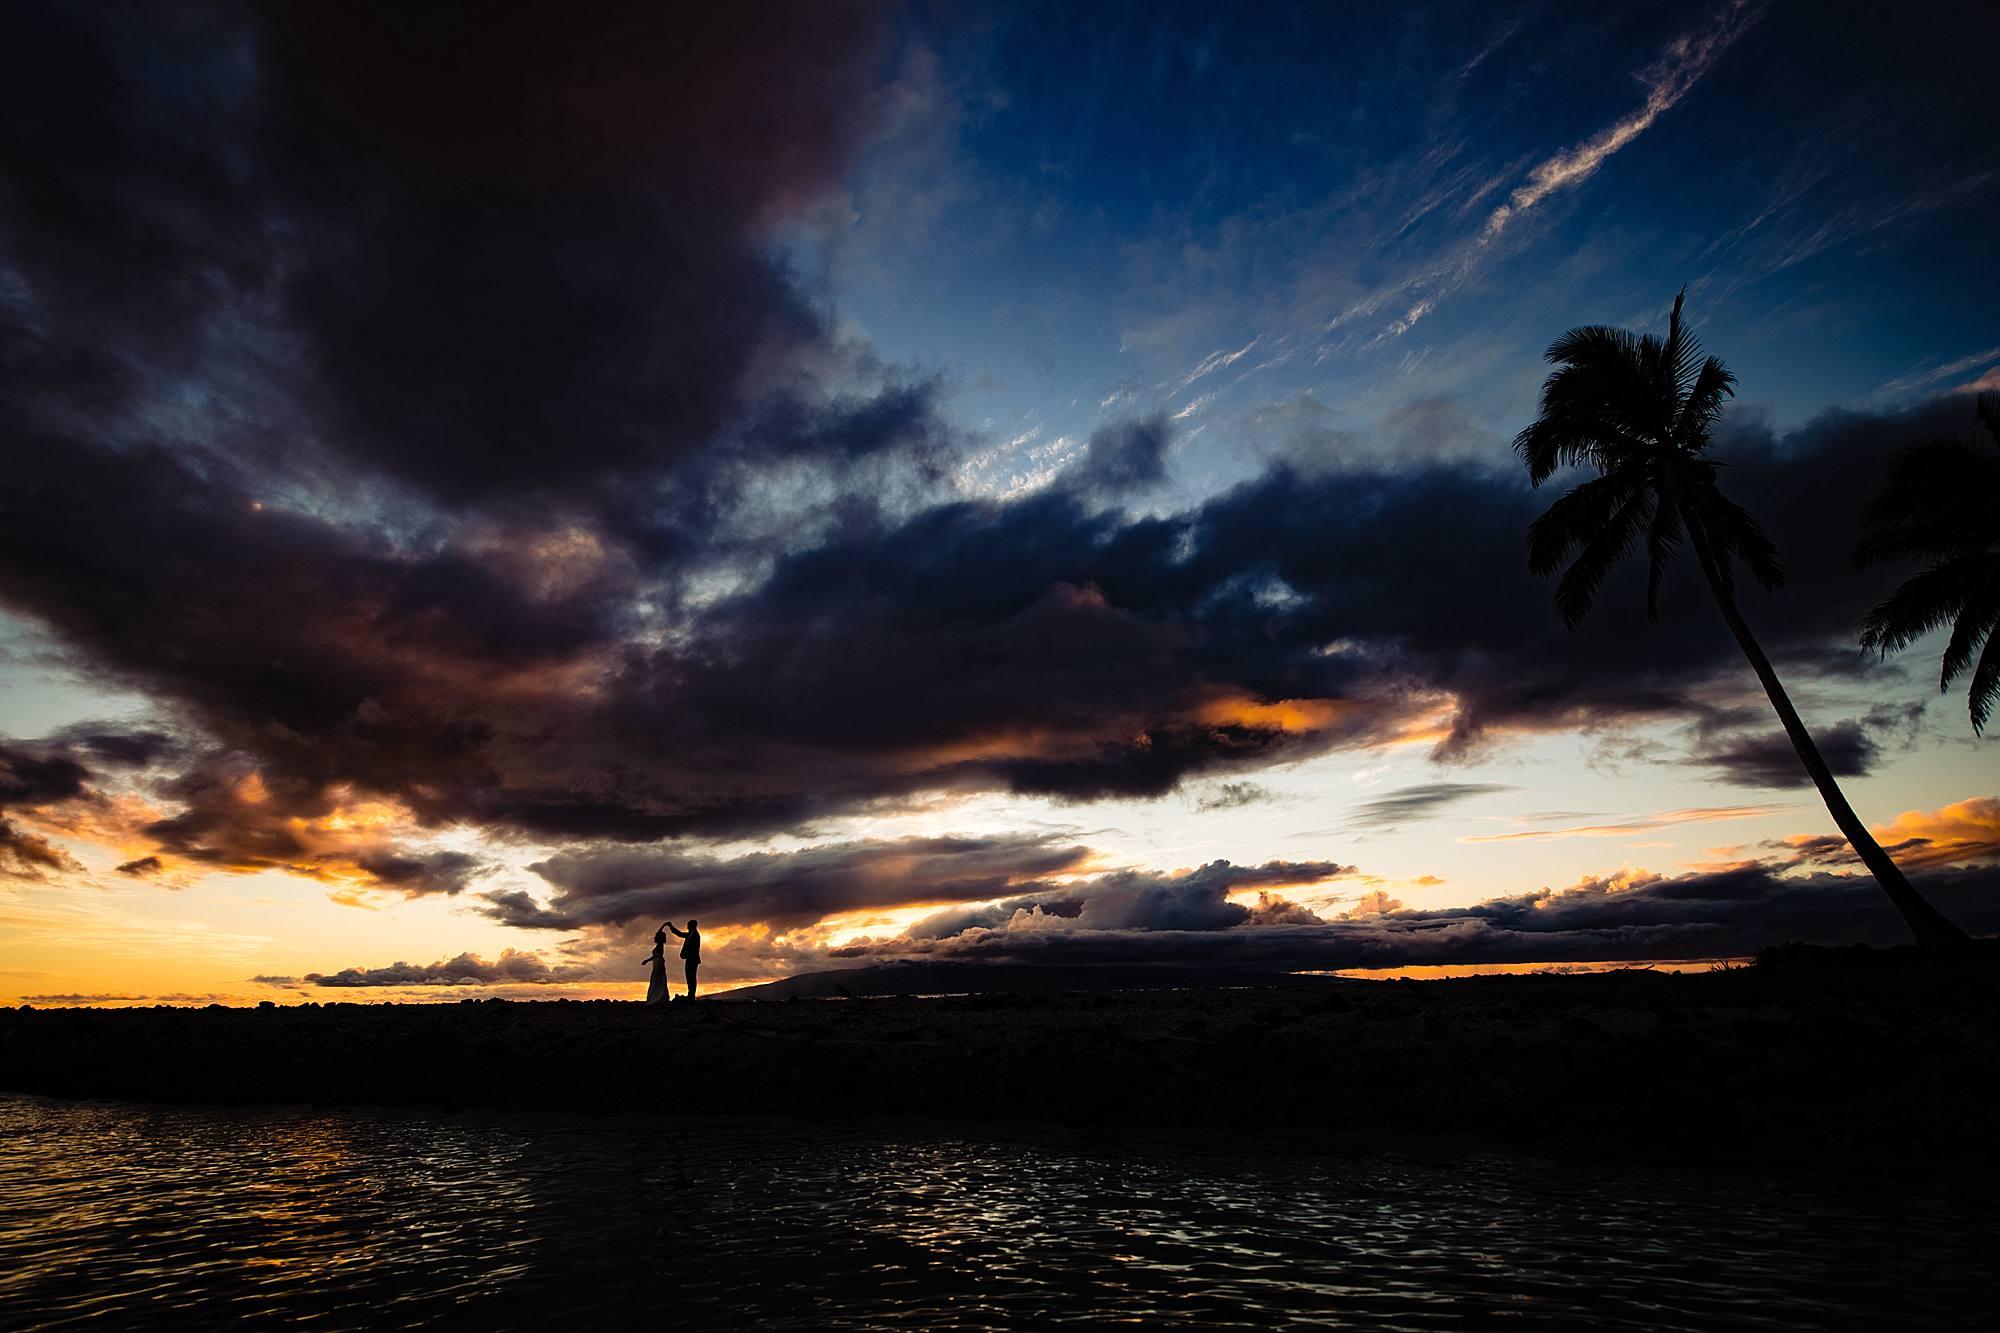 sunset silhouette at olowalu plantation house